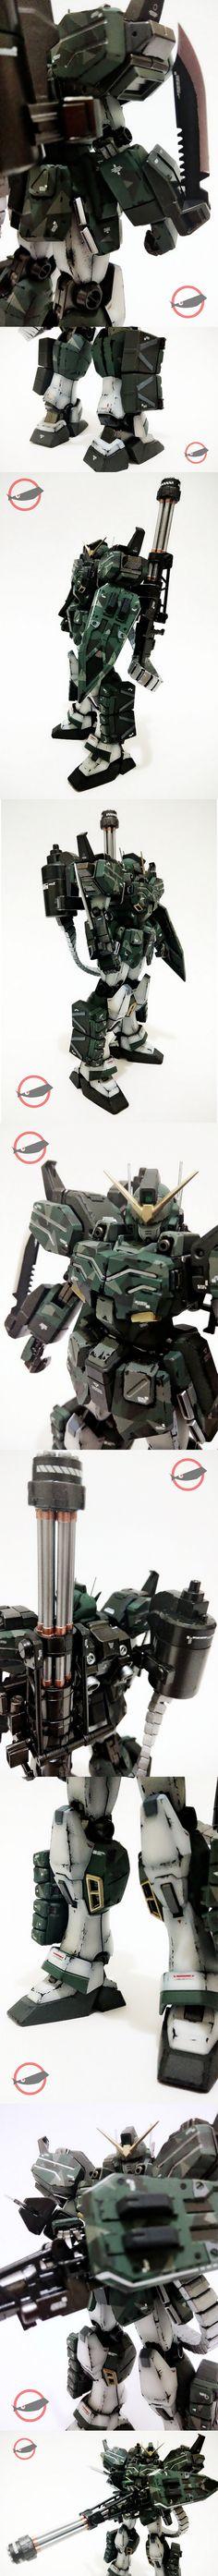 Gundam Heavyarms Guerilla Warfare Detail Looks 1